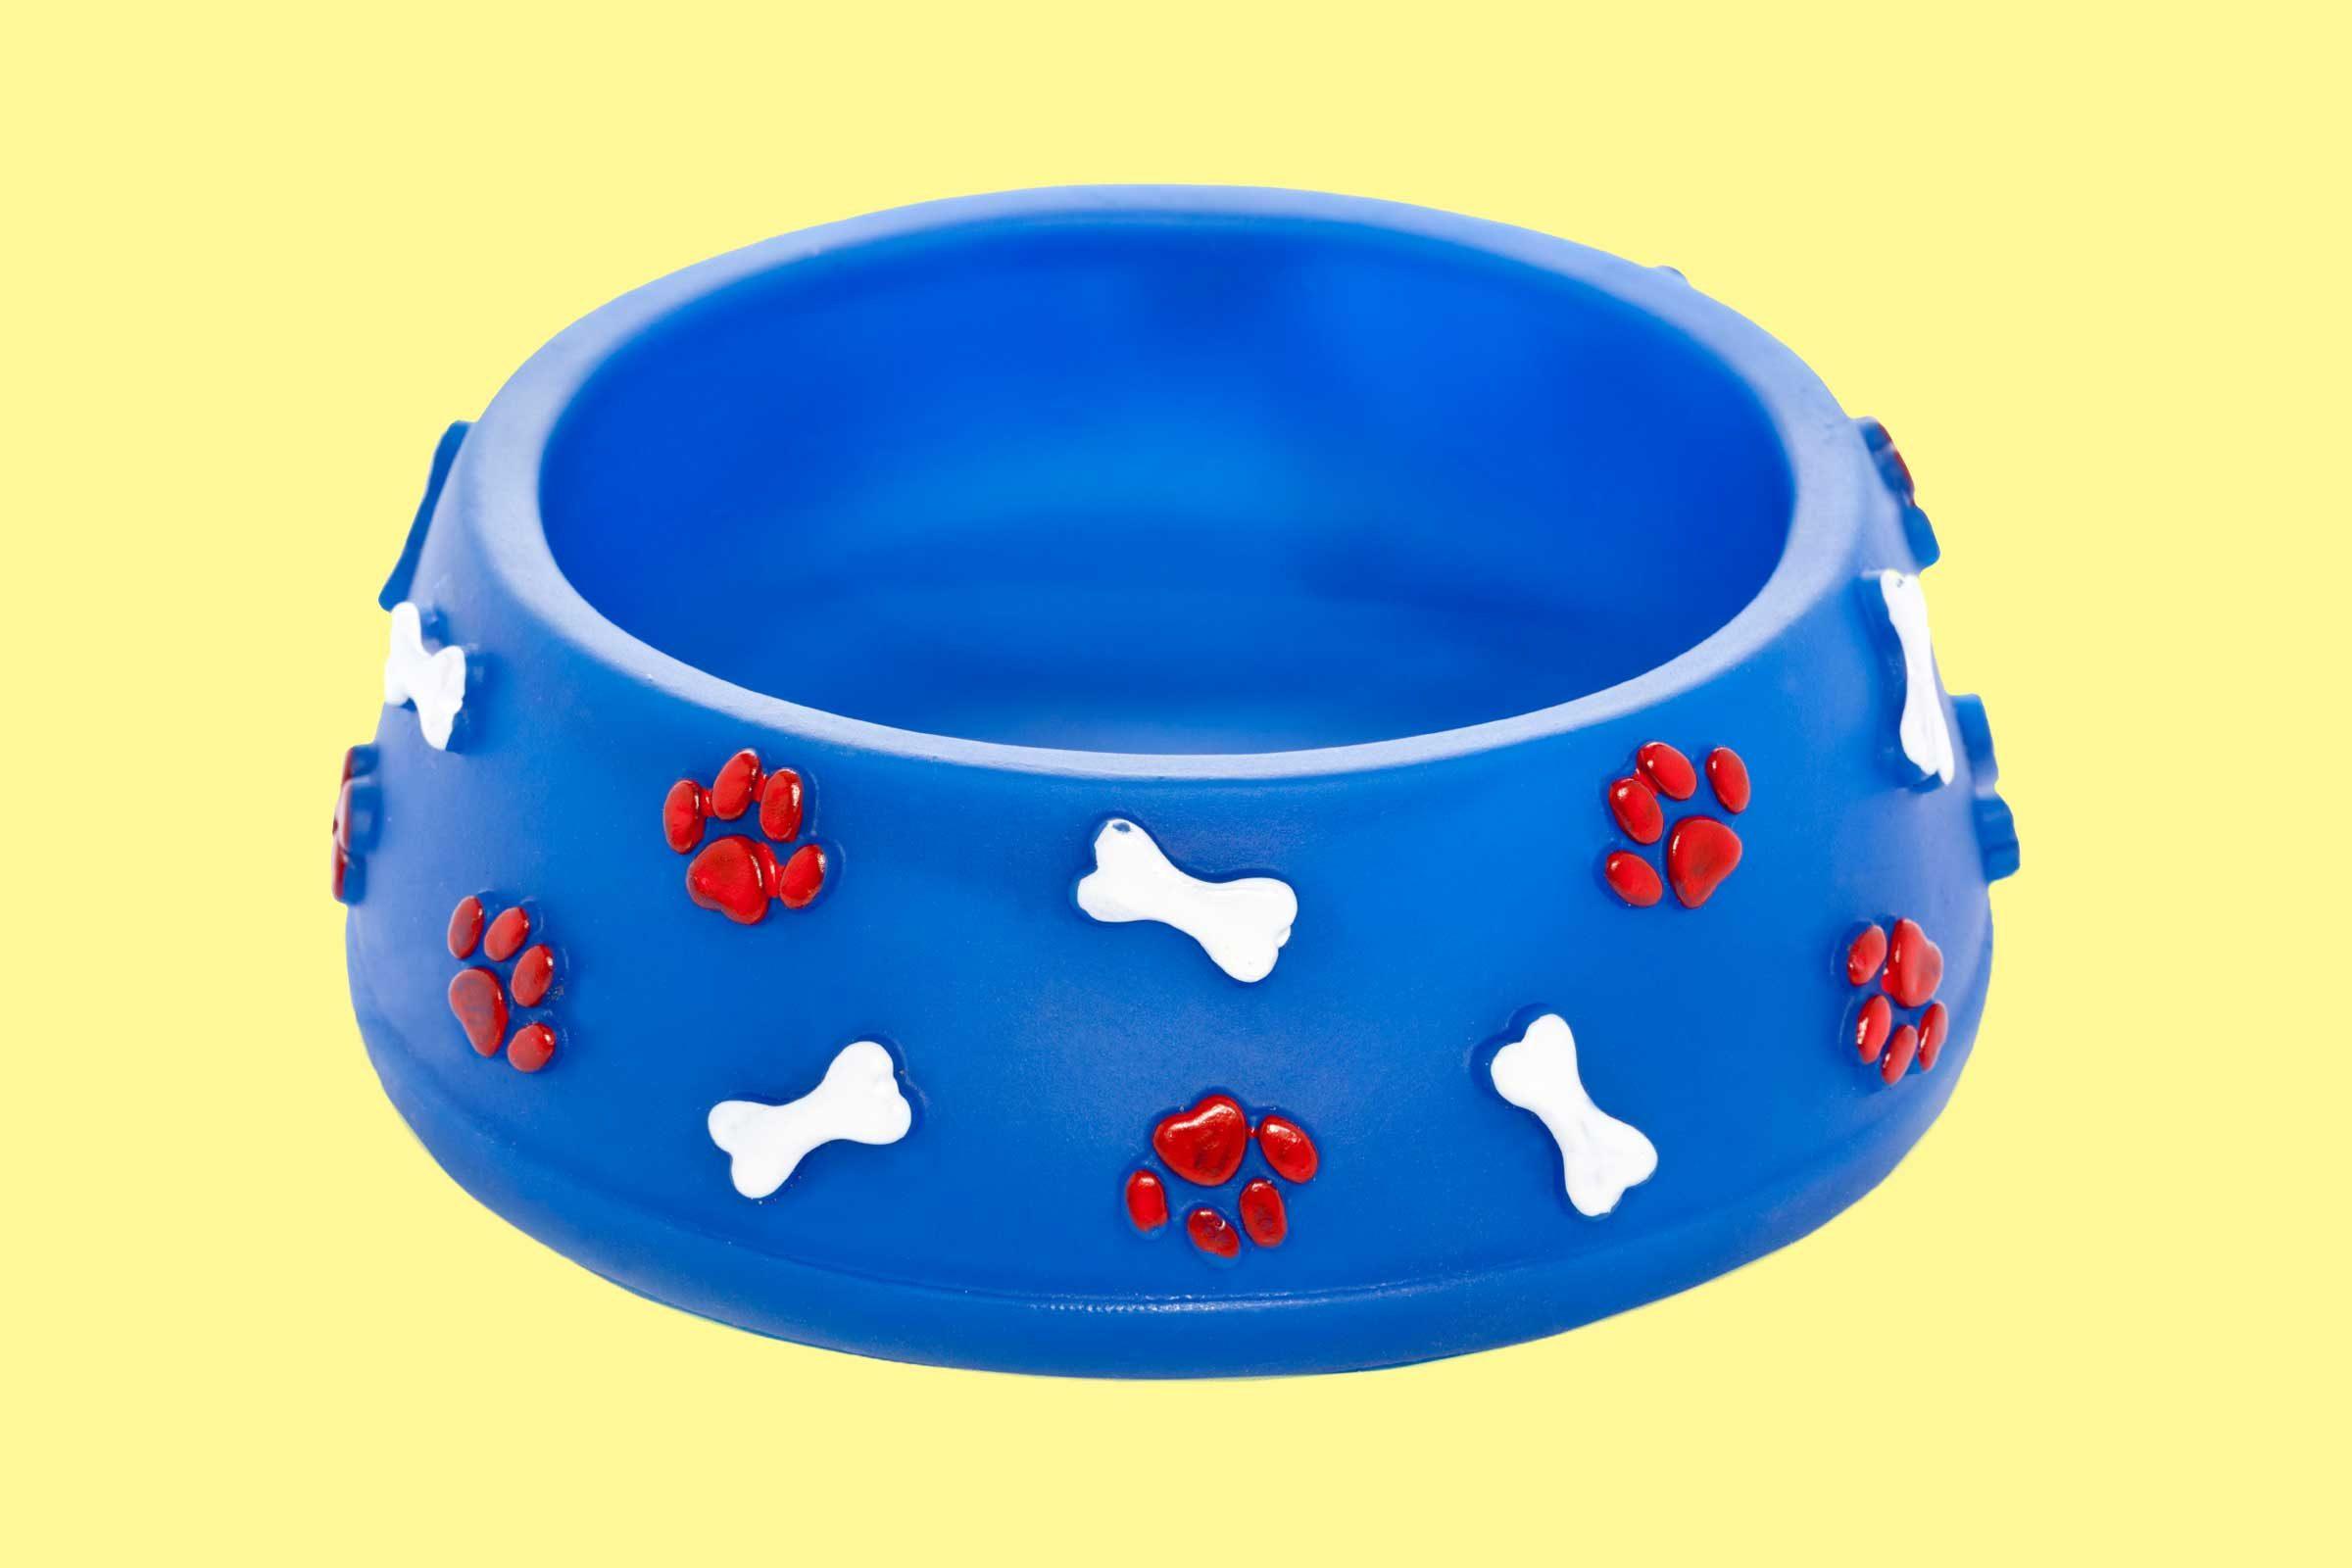 Can I Use Regular Bowl For Dog Food